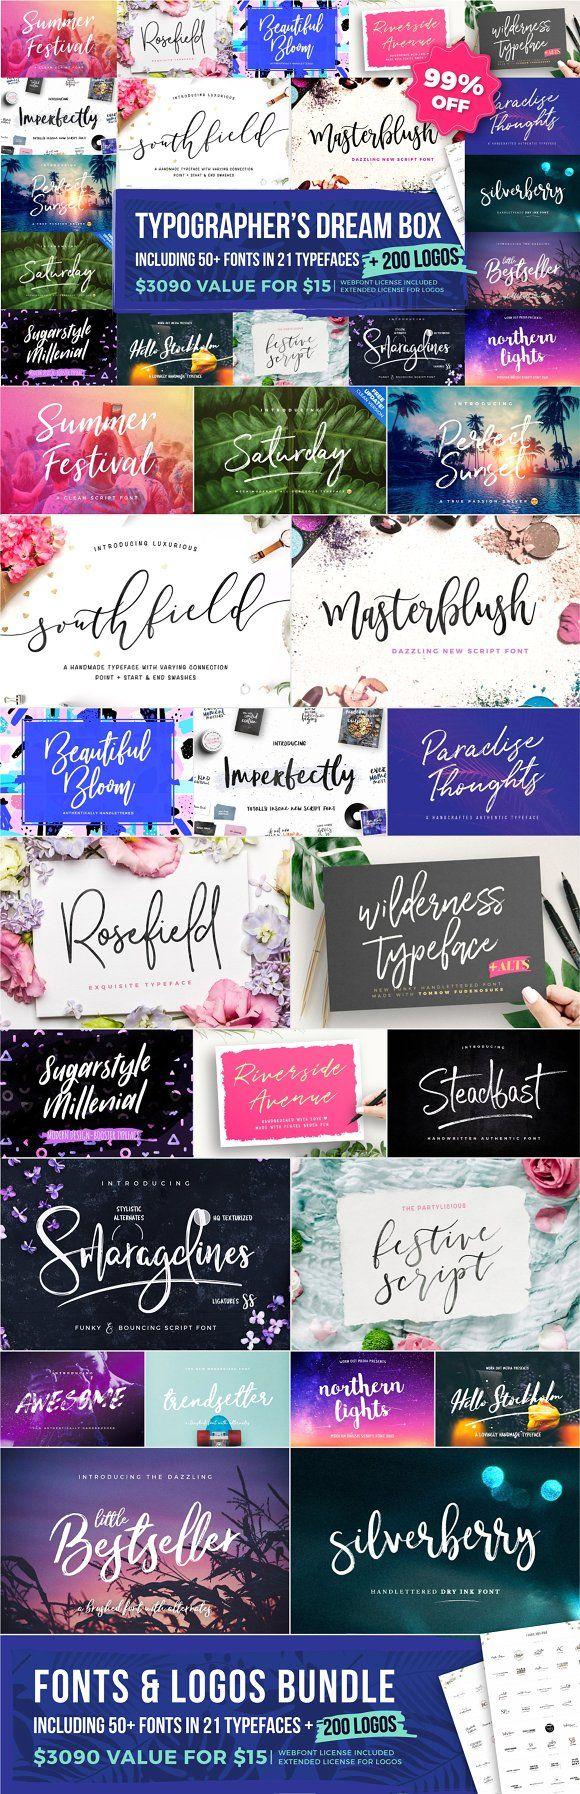 Typographer's Dream Box + 200 Logos by Mats-Peter Forss on @creativemarket